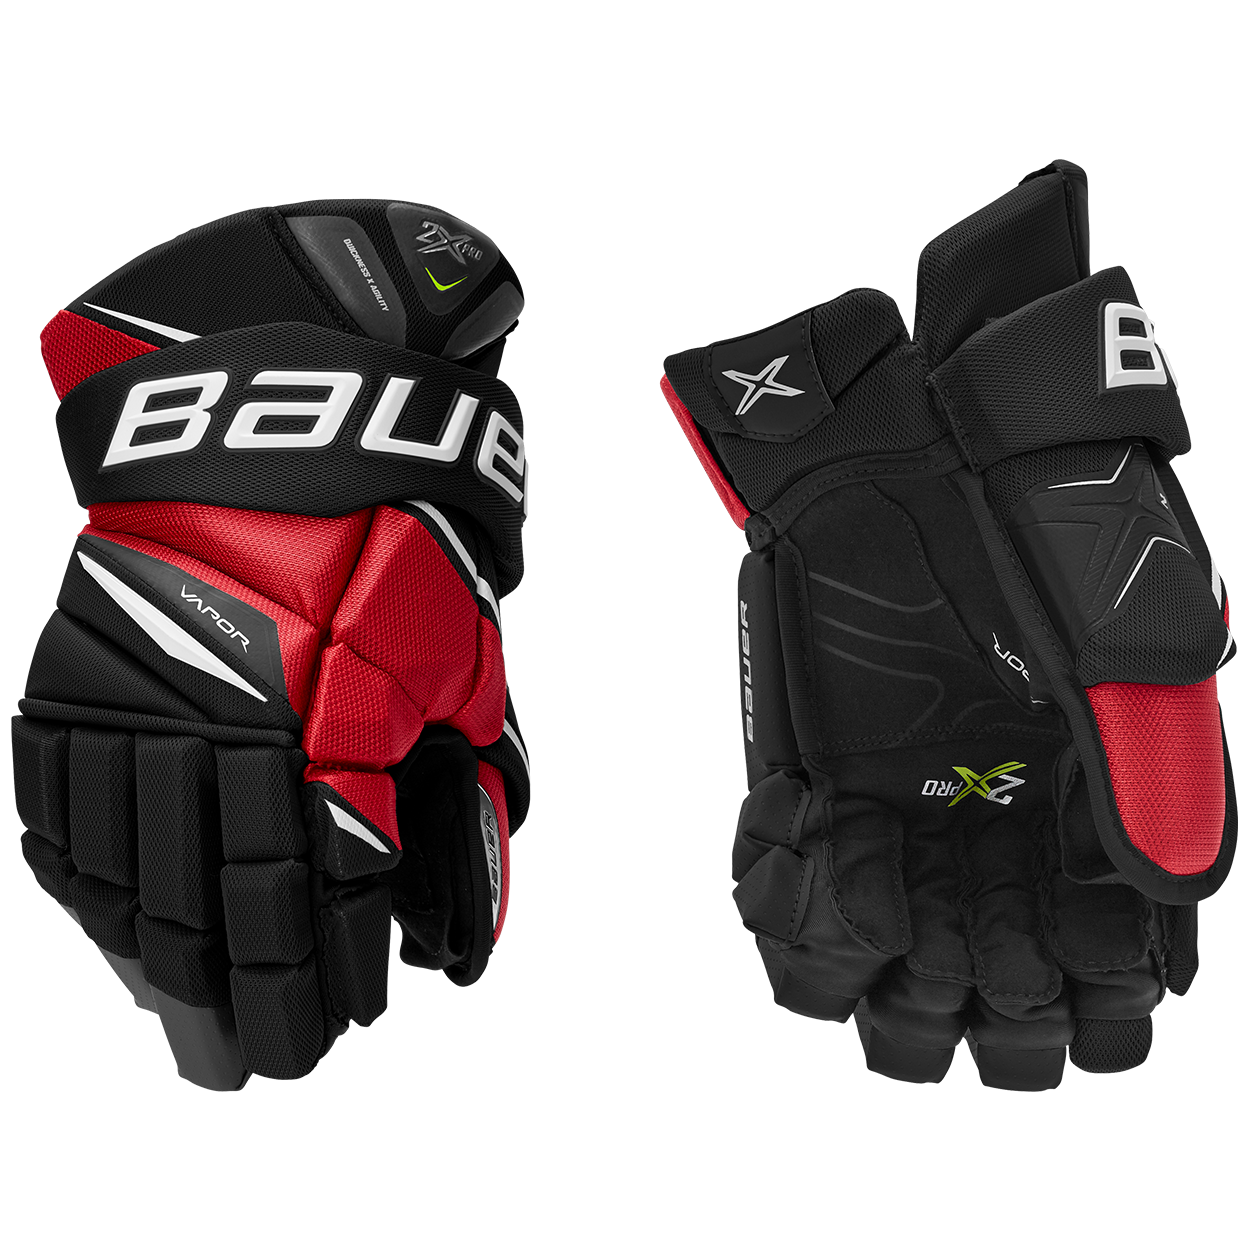 Vapor 2X PRO Gloves